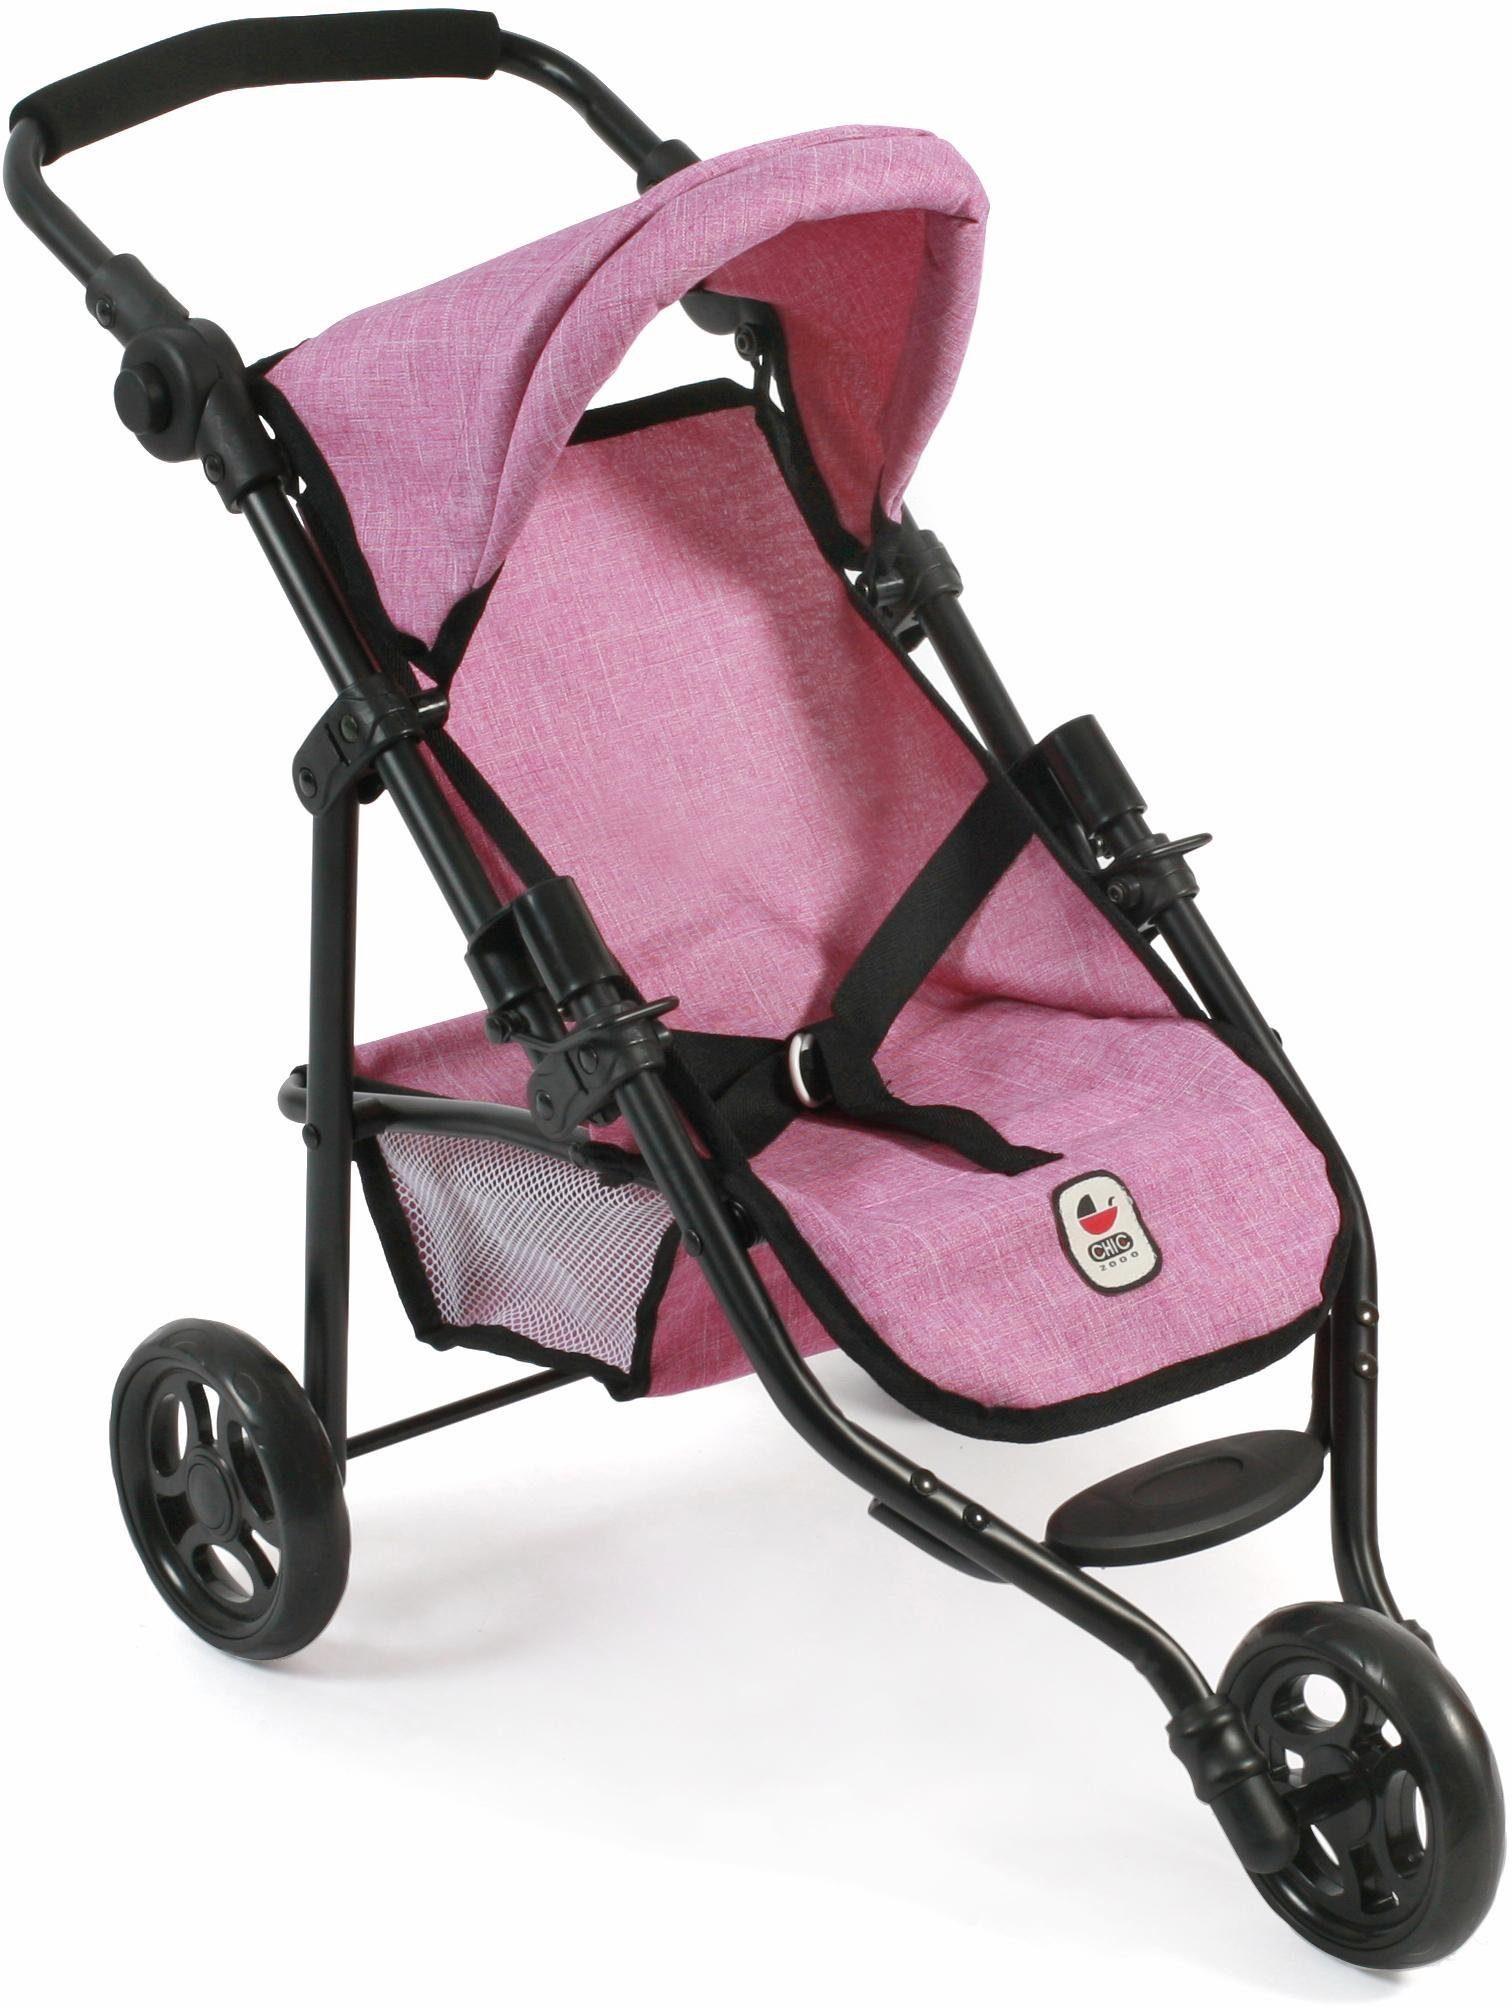 CHIC2000 Puppen Jogging Buggy mit Gurt, »Lola, pink«